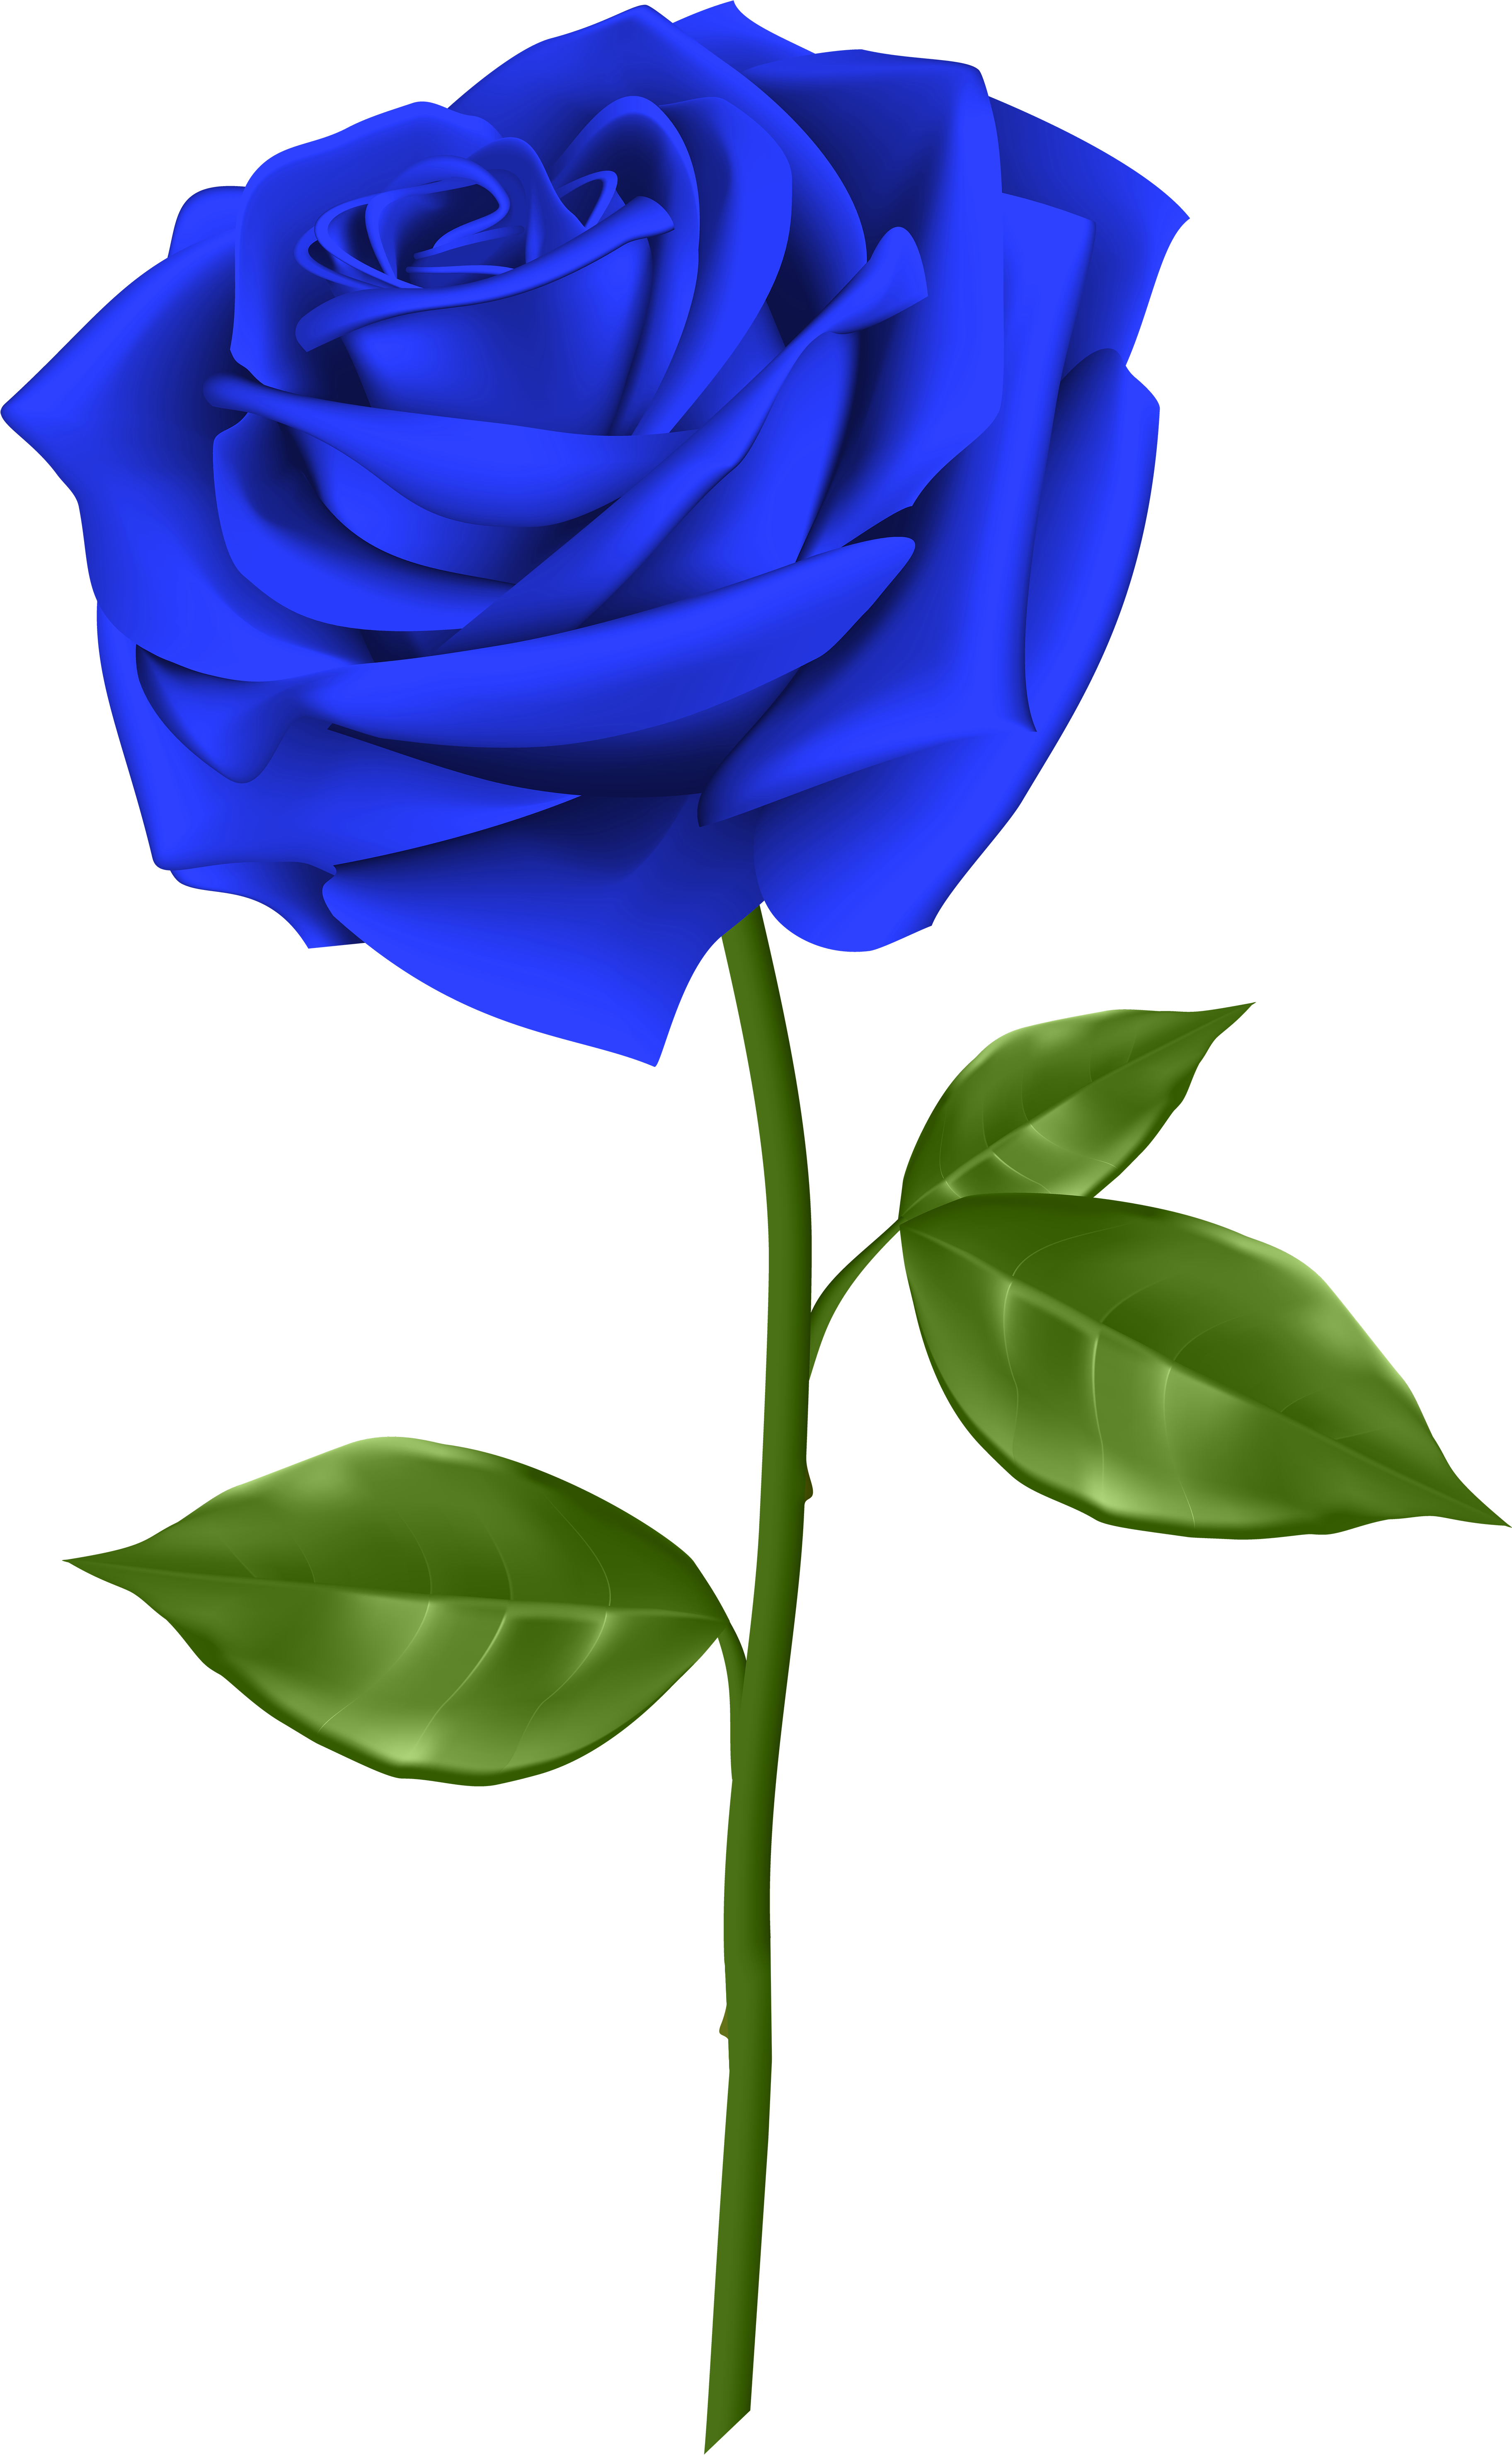 Short stem rose clipart clip freeuse library Svg Blue Rose Clipart - Blue Rose Transparent Background - Png ... clip freeuse library